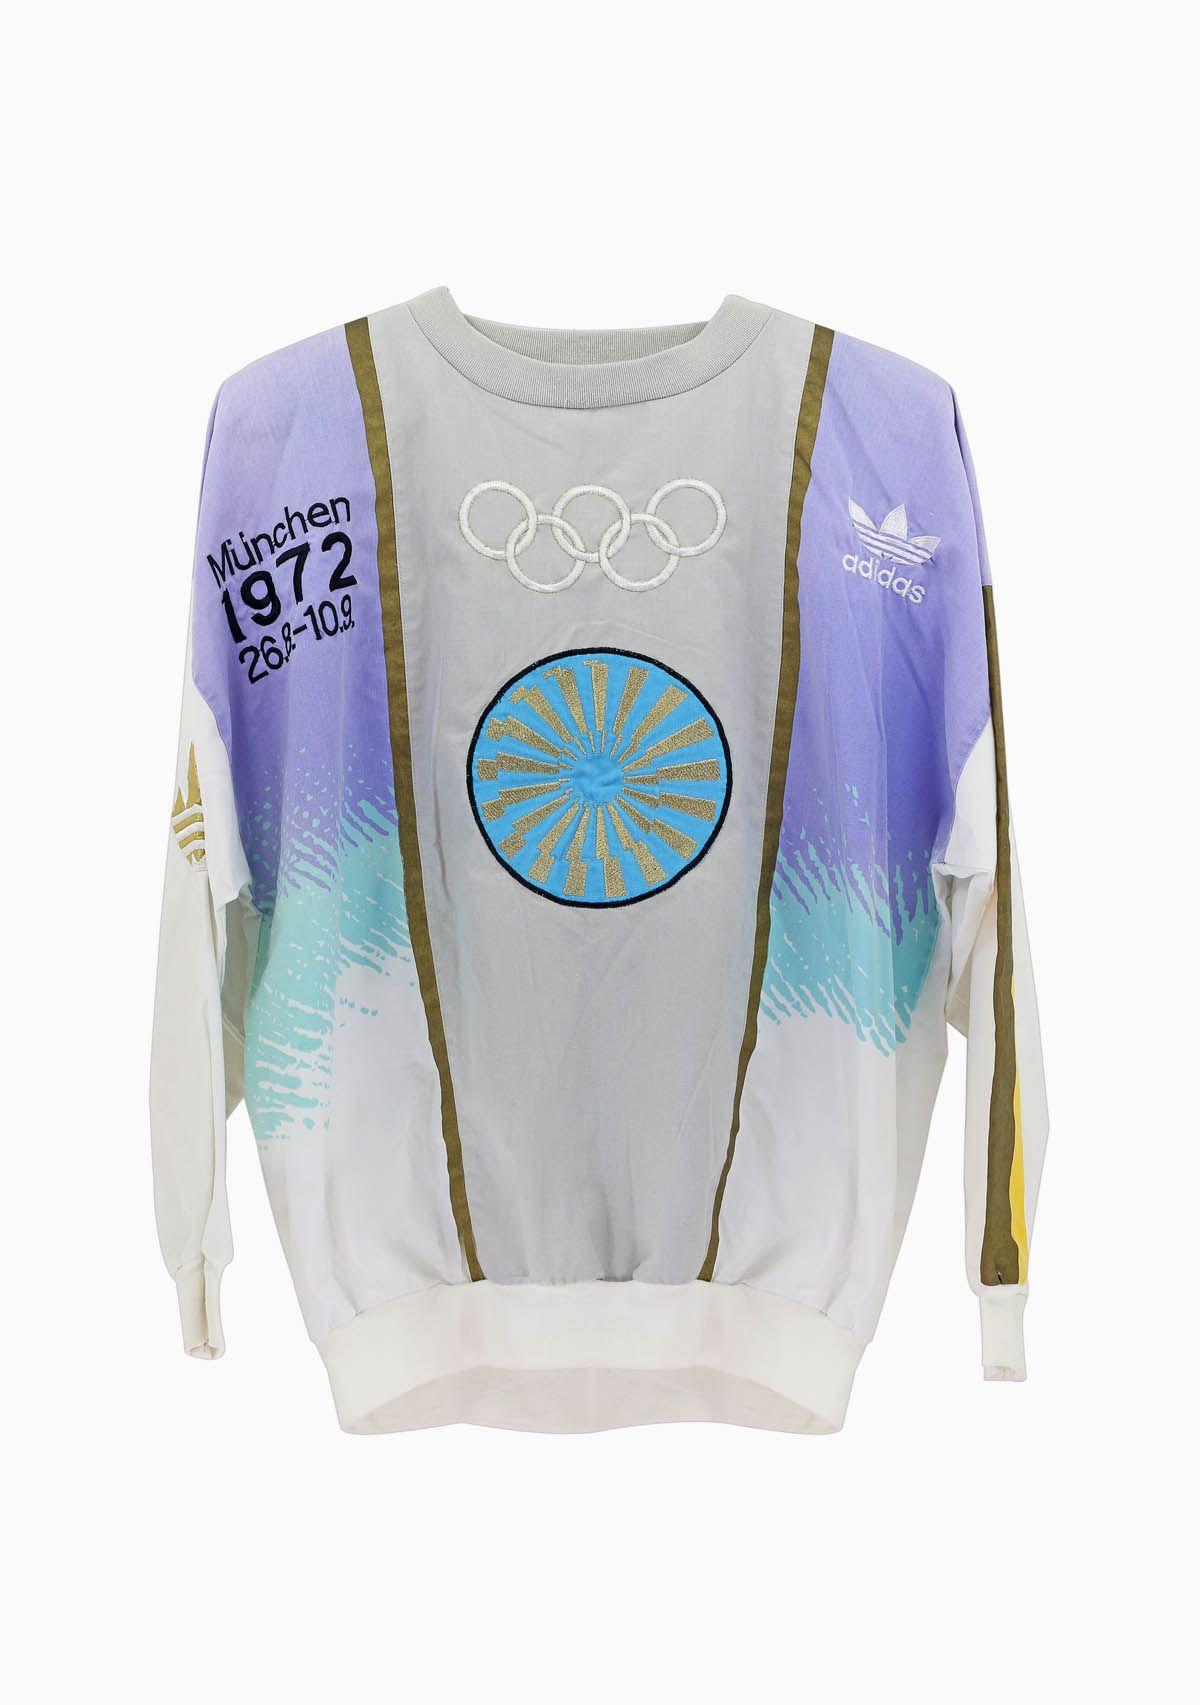 Adidas Munchen Olympics sweatshirt | print in 2019